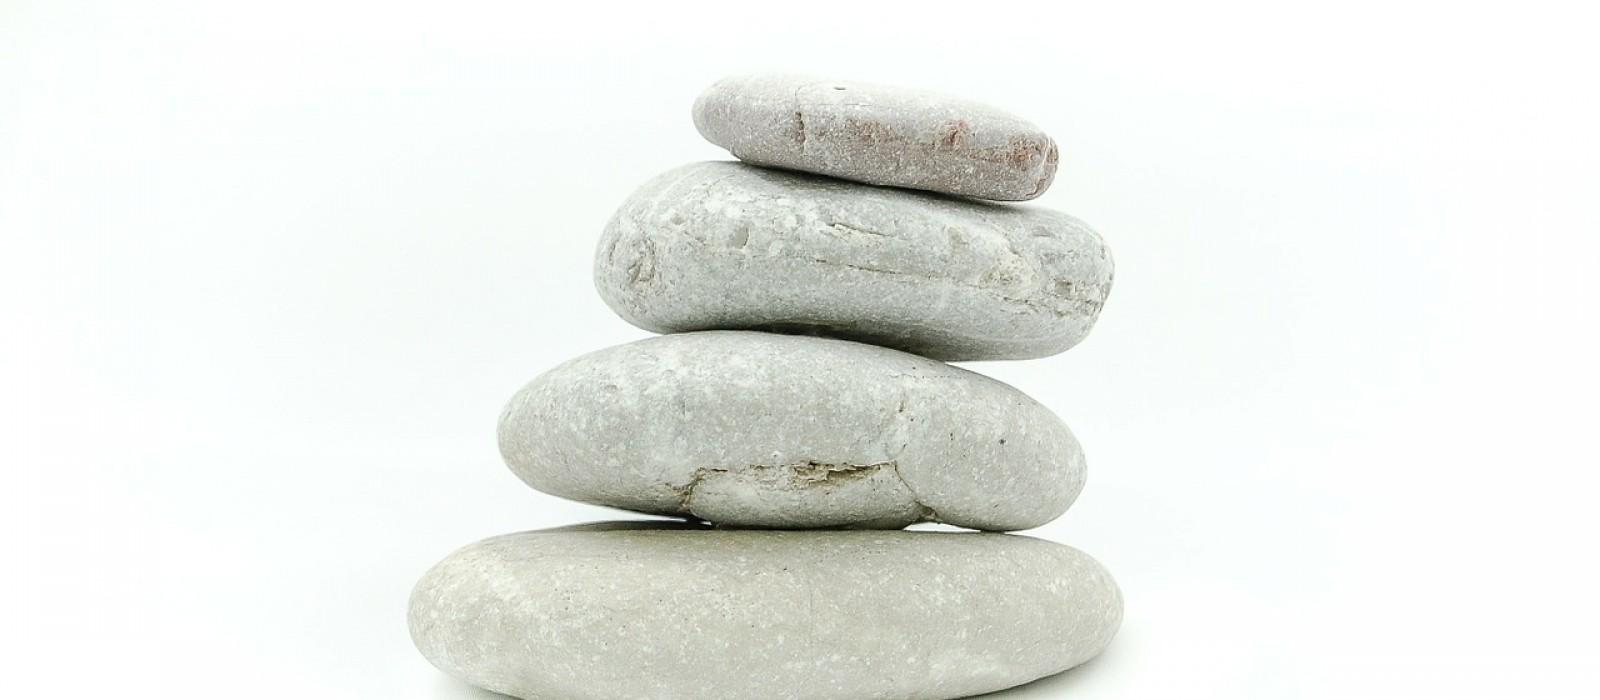 http://strefamice.pl/wp-content/uploads/2015/06/the-stones-263661_1280-1600x700_1.jpg